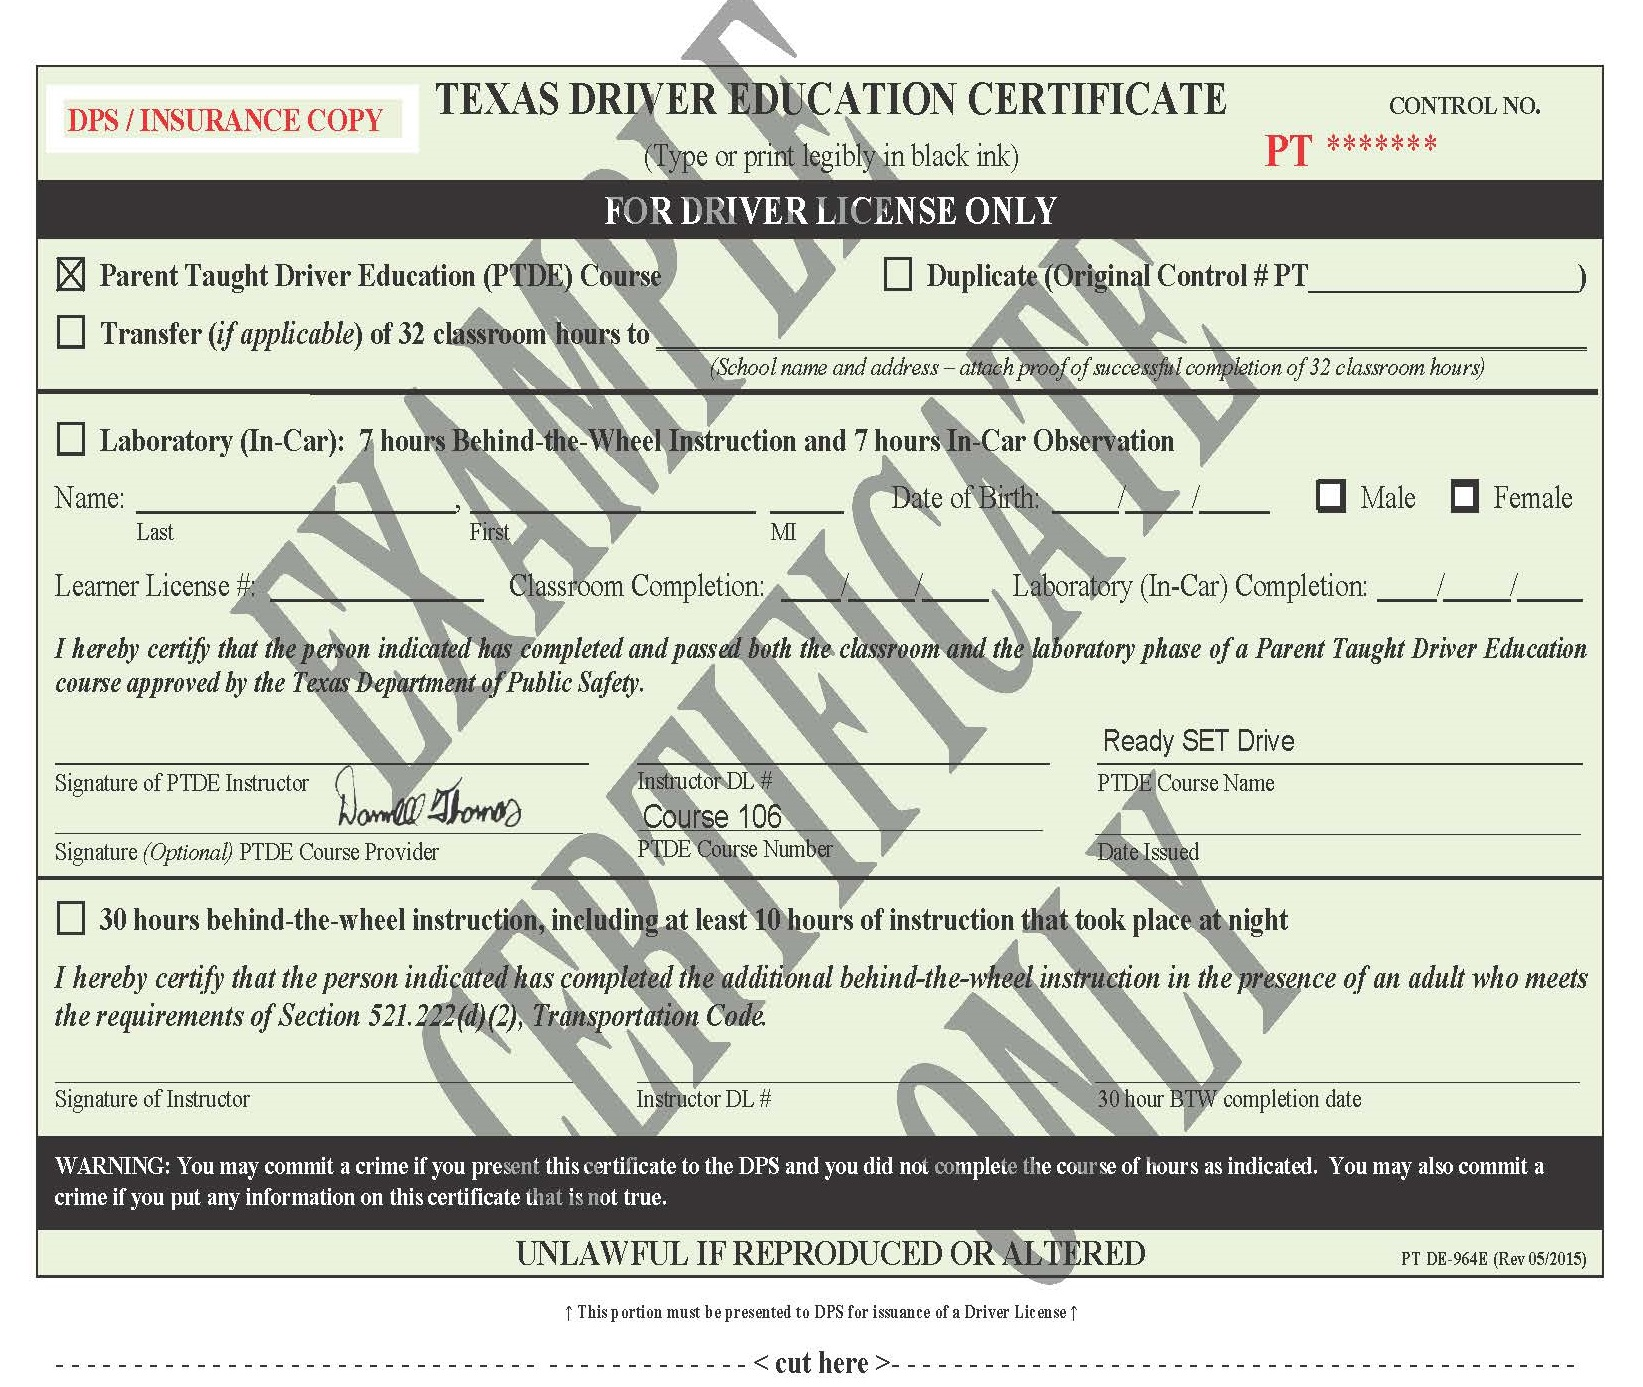 604 Duplicate De 964e Certificate Ready Set Drive Course 106